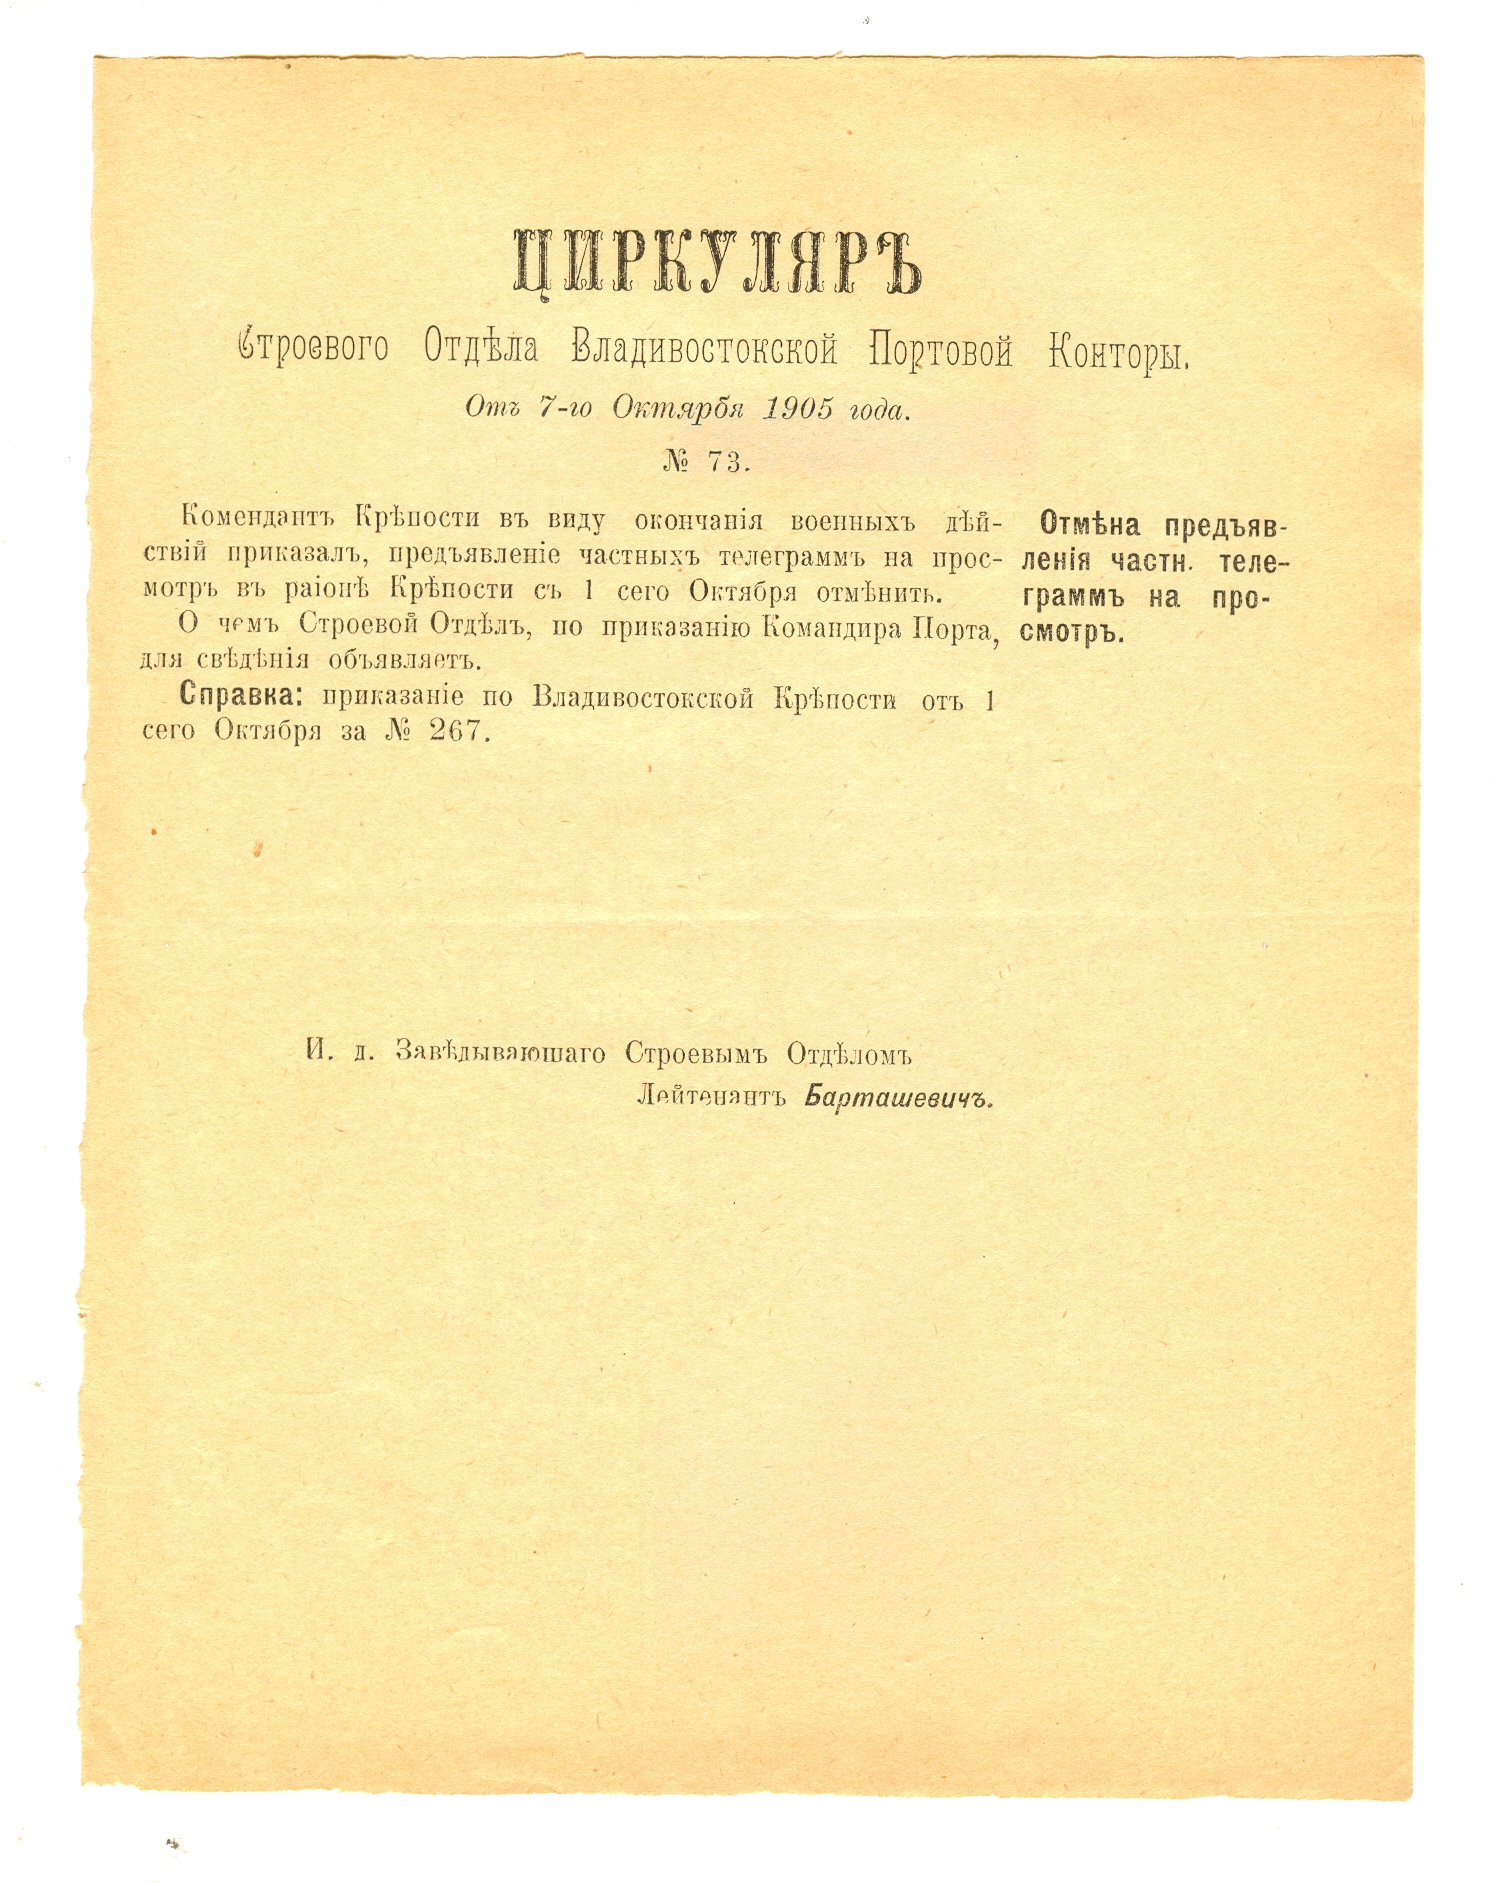 От 7-го Октября 1905 года.